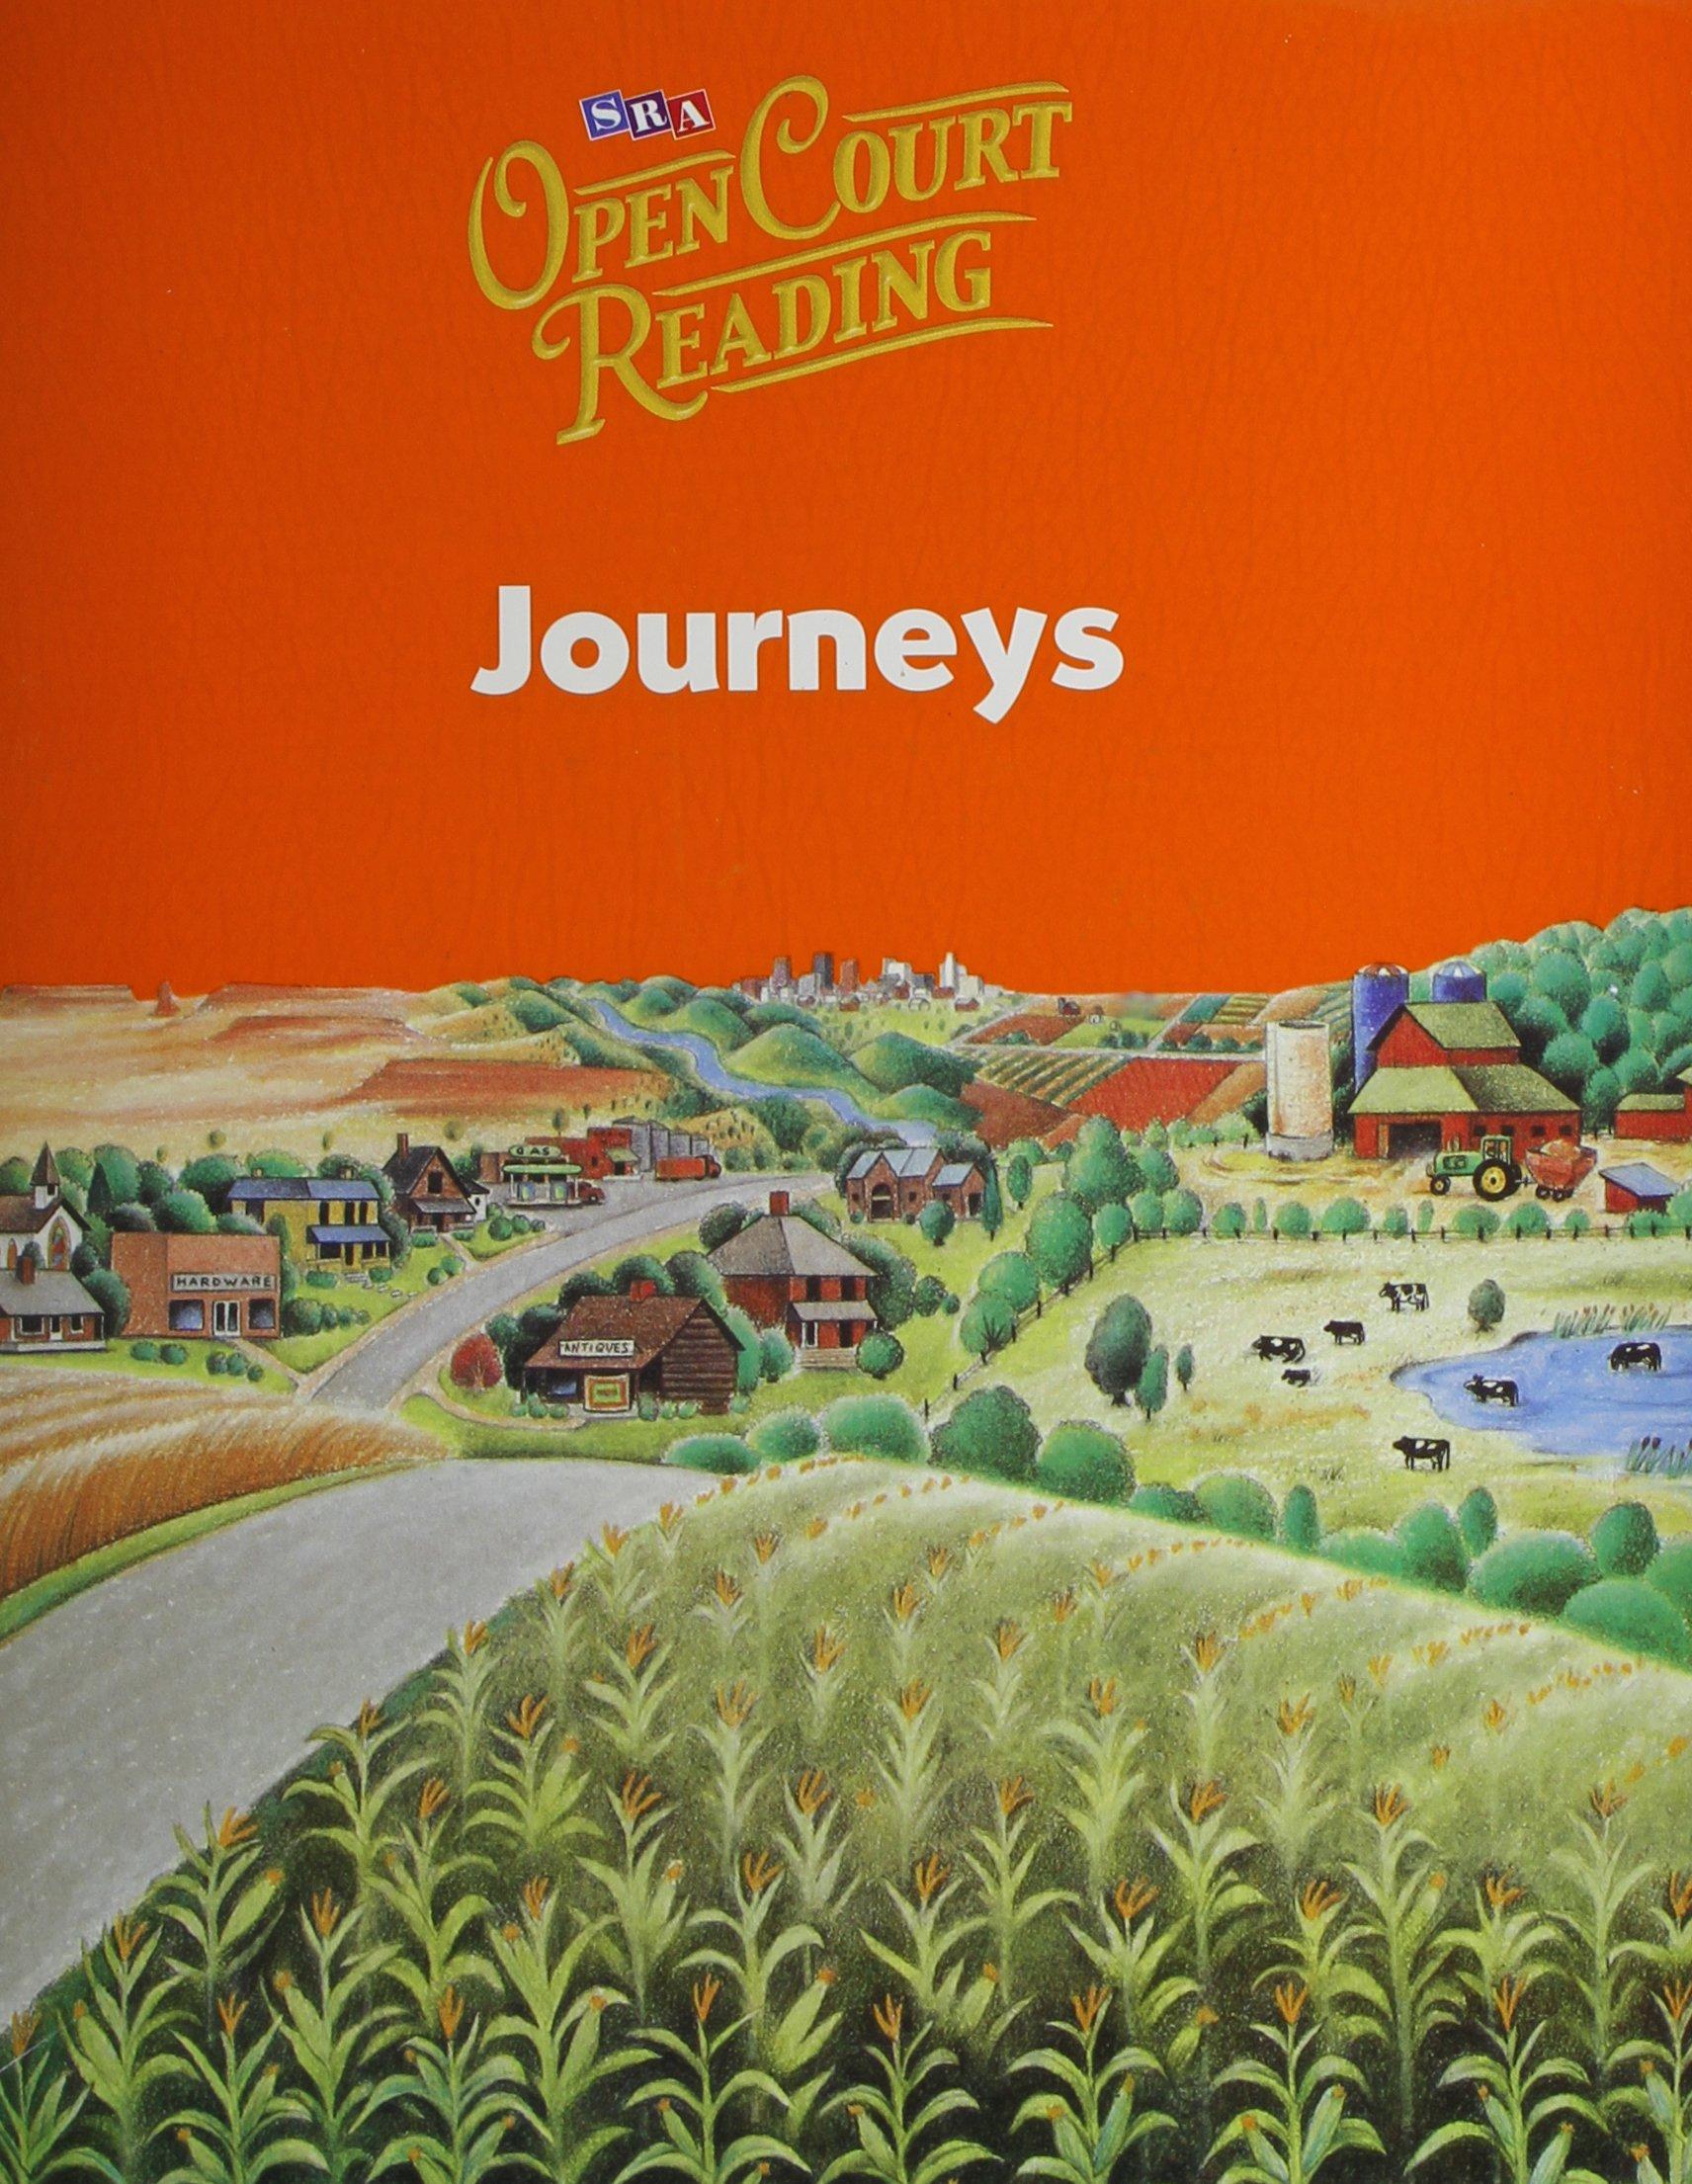 Open Court Reading: Journeys (IMAGINE IT) PDF